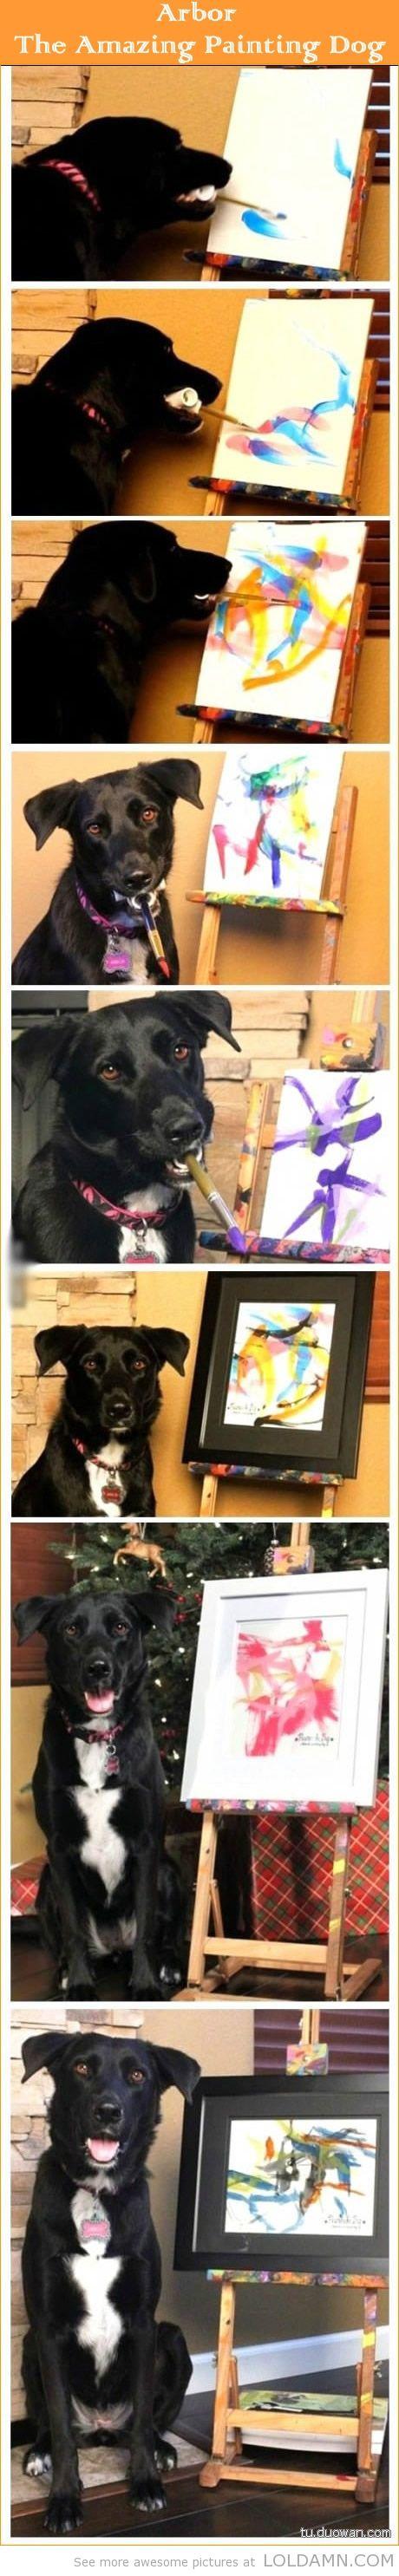 Paw-casso: Arbor the Amazing Painting Dog.